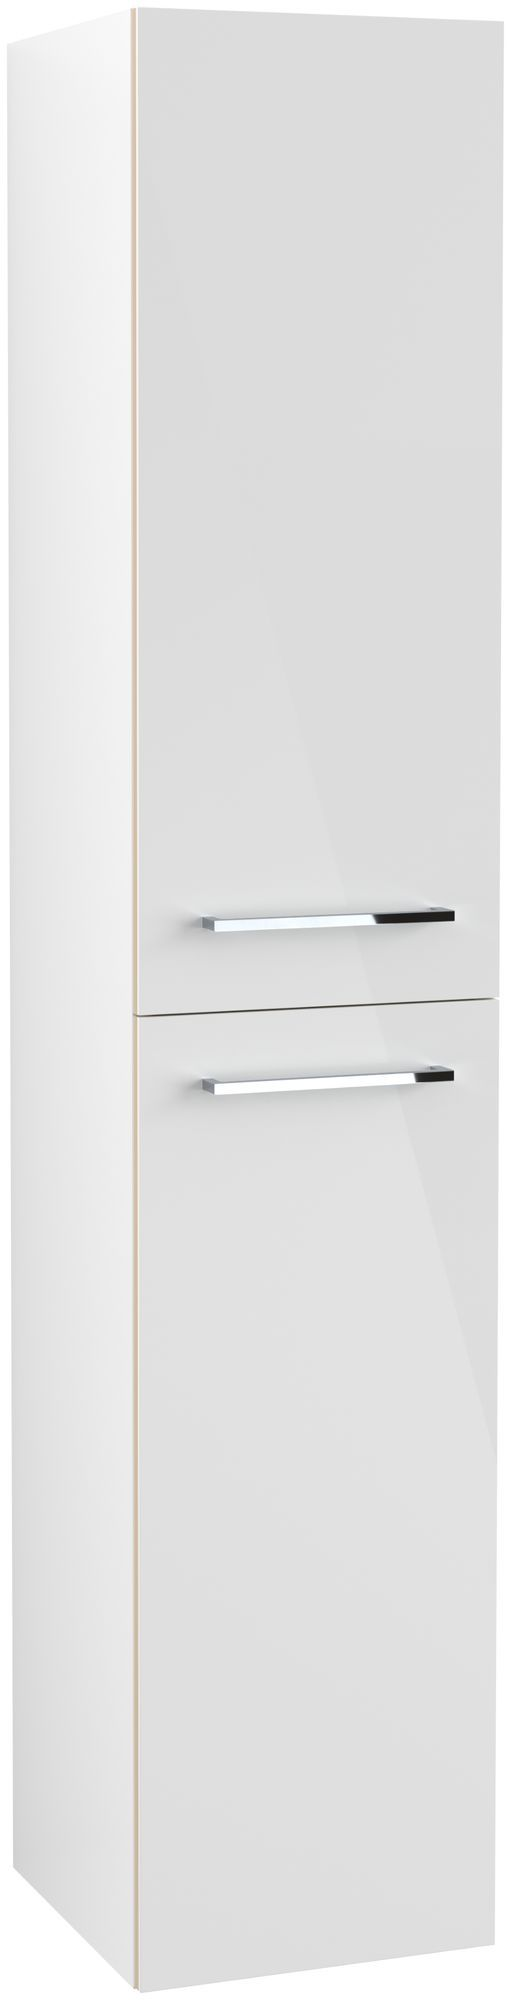 Villeroy & Boch Avento Hochschrank Türanschlag links B:35 x H:176 x T:37 cm crystal white A89400B4